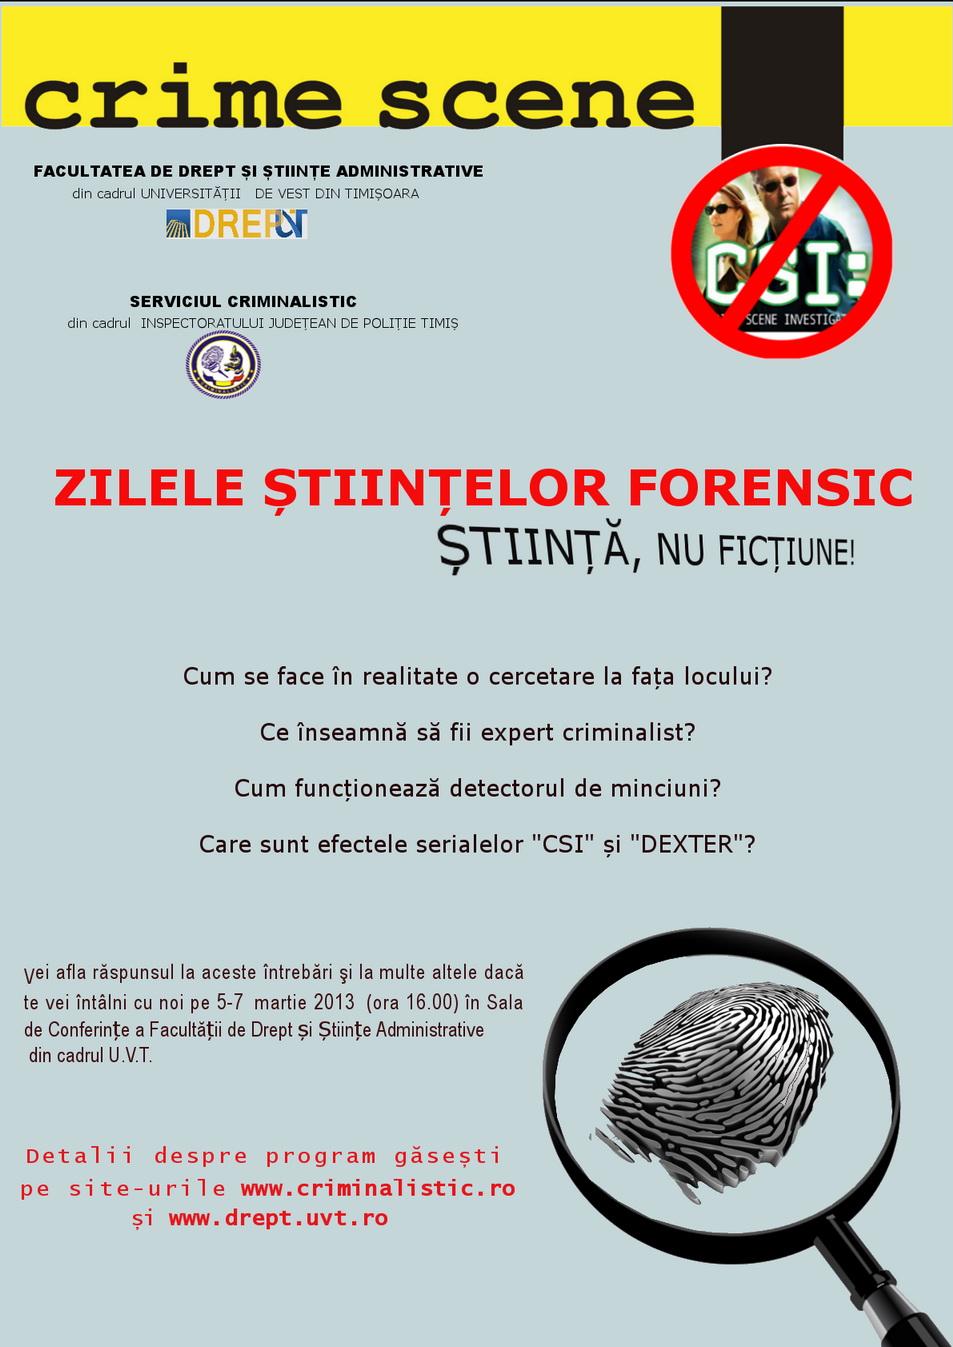 www.criminalistic.ro